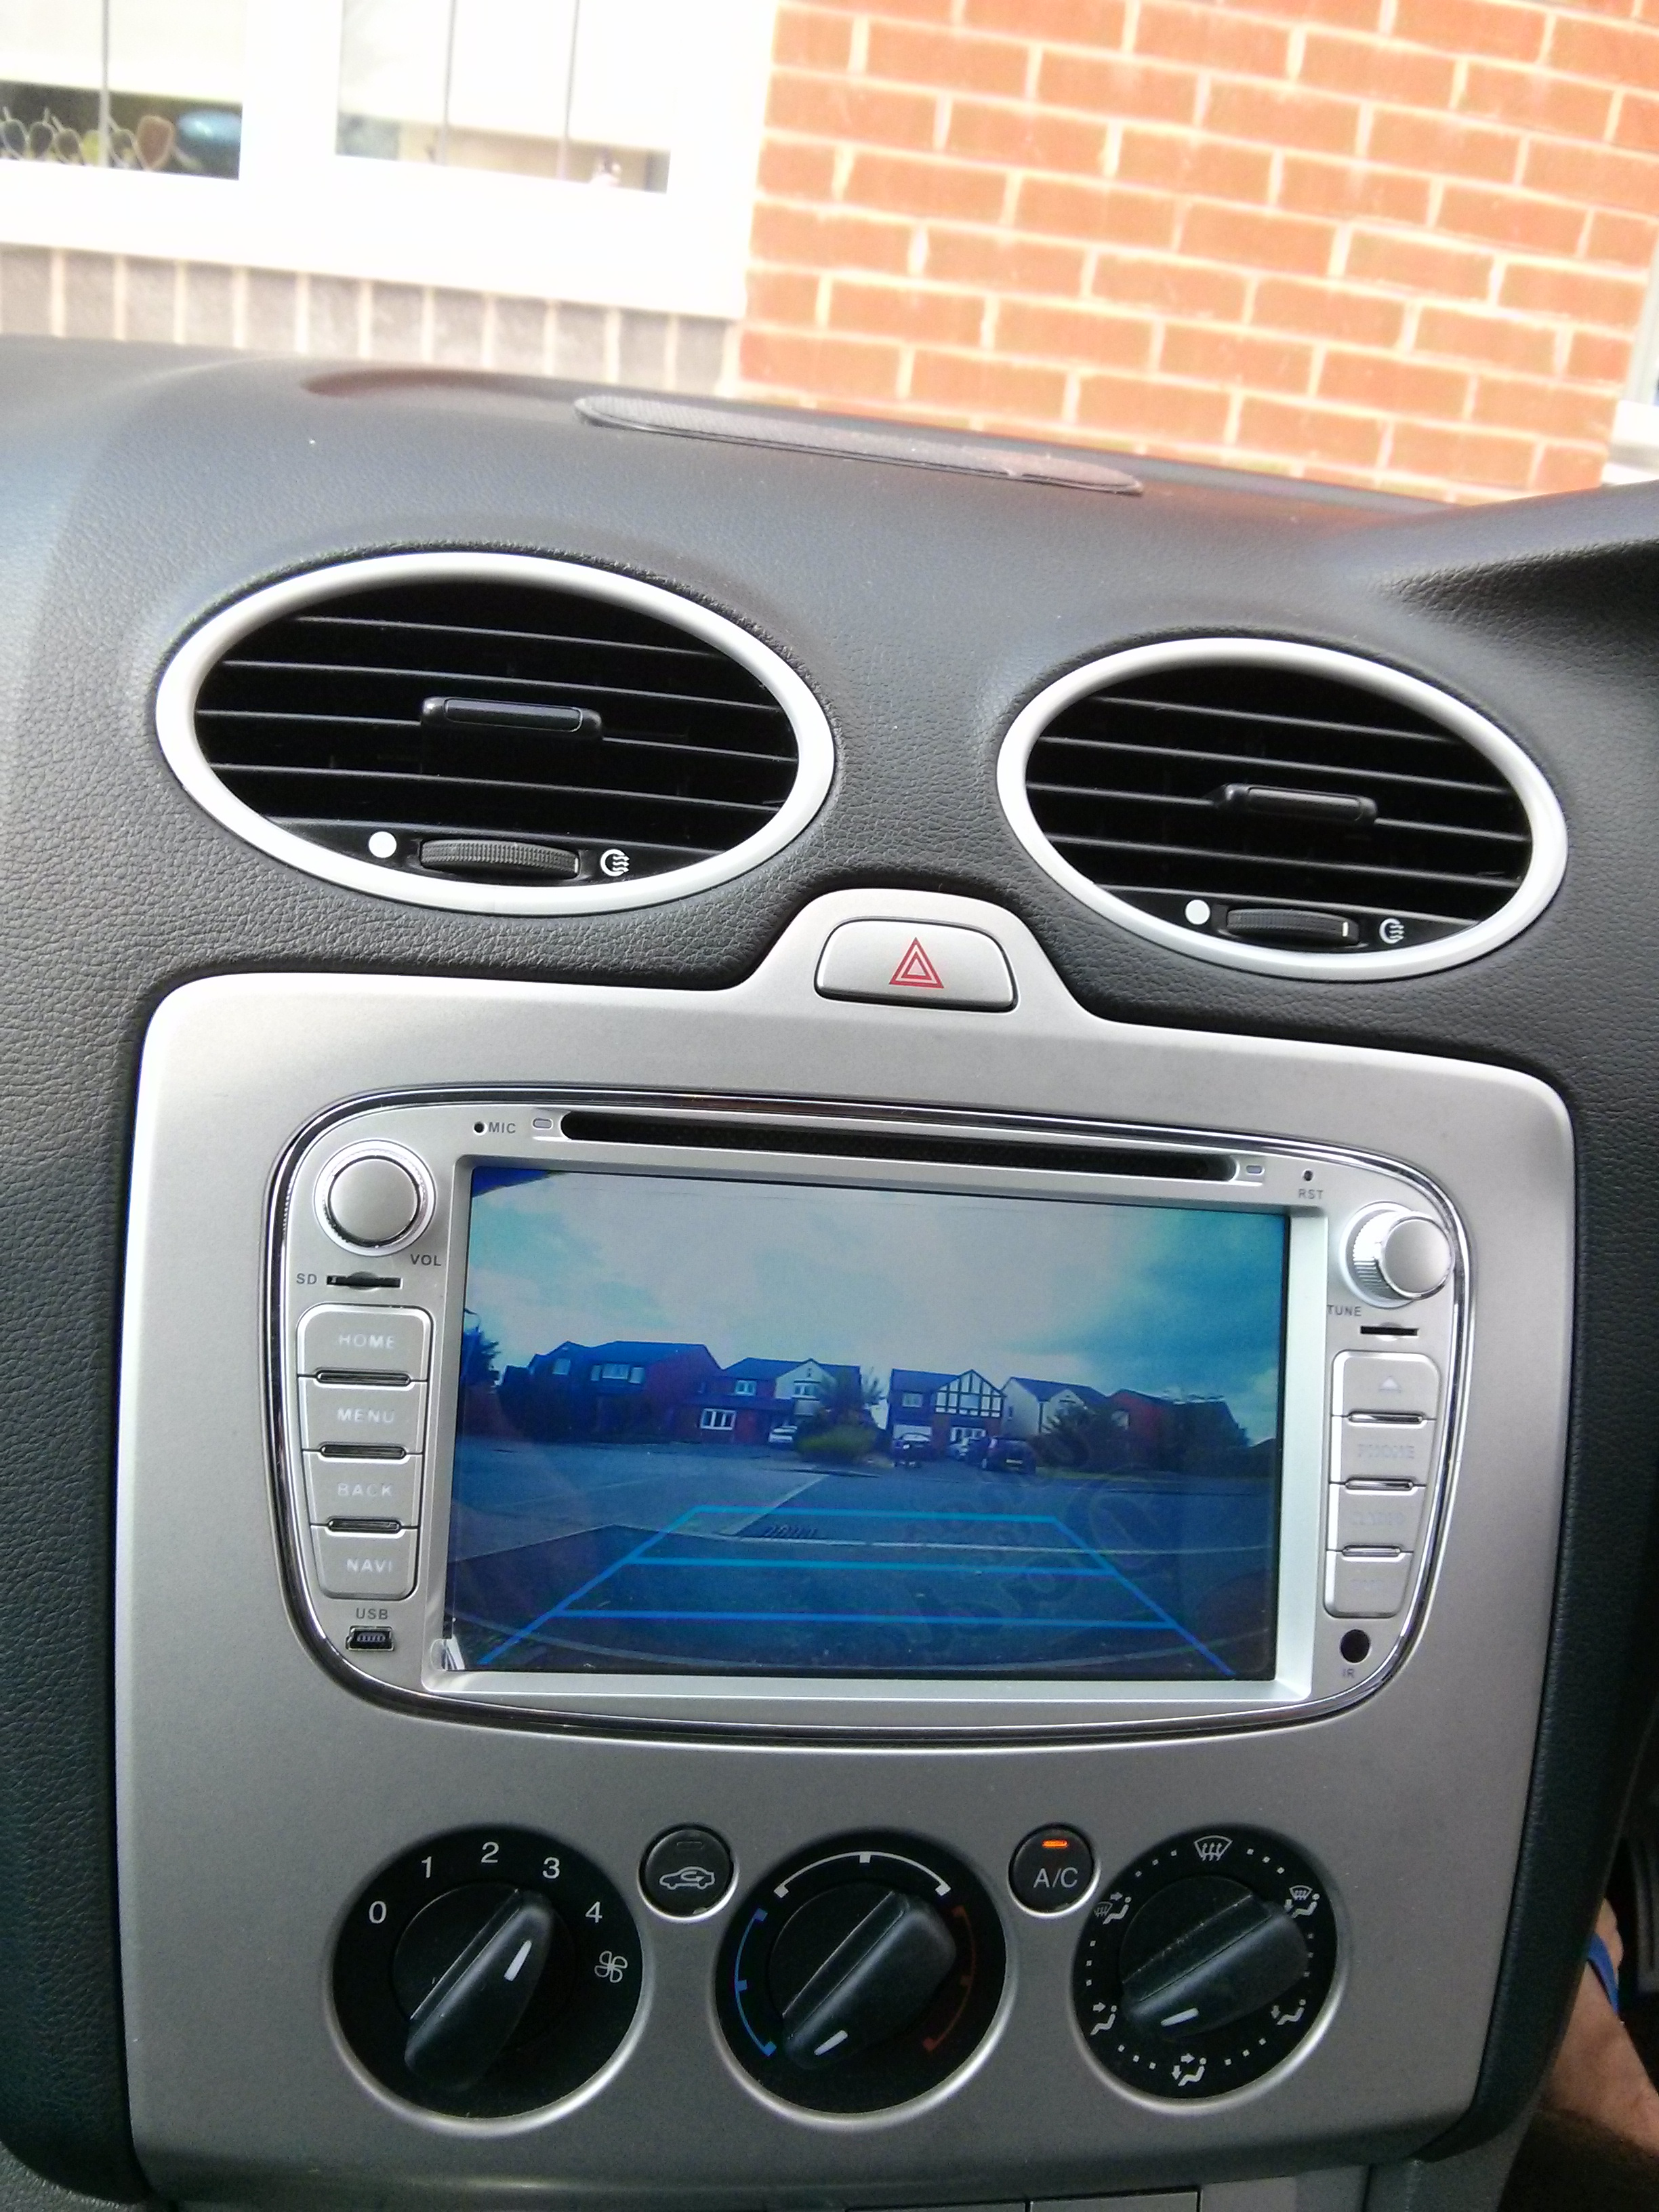 Raspberry pi car computer now with reverse camera